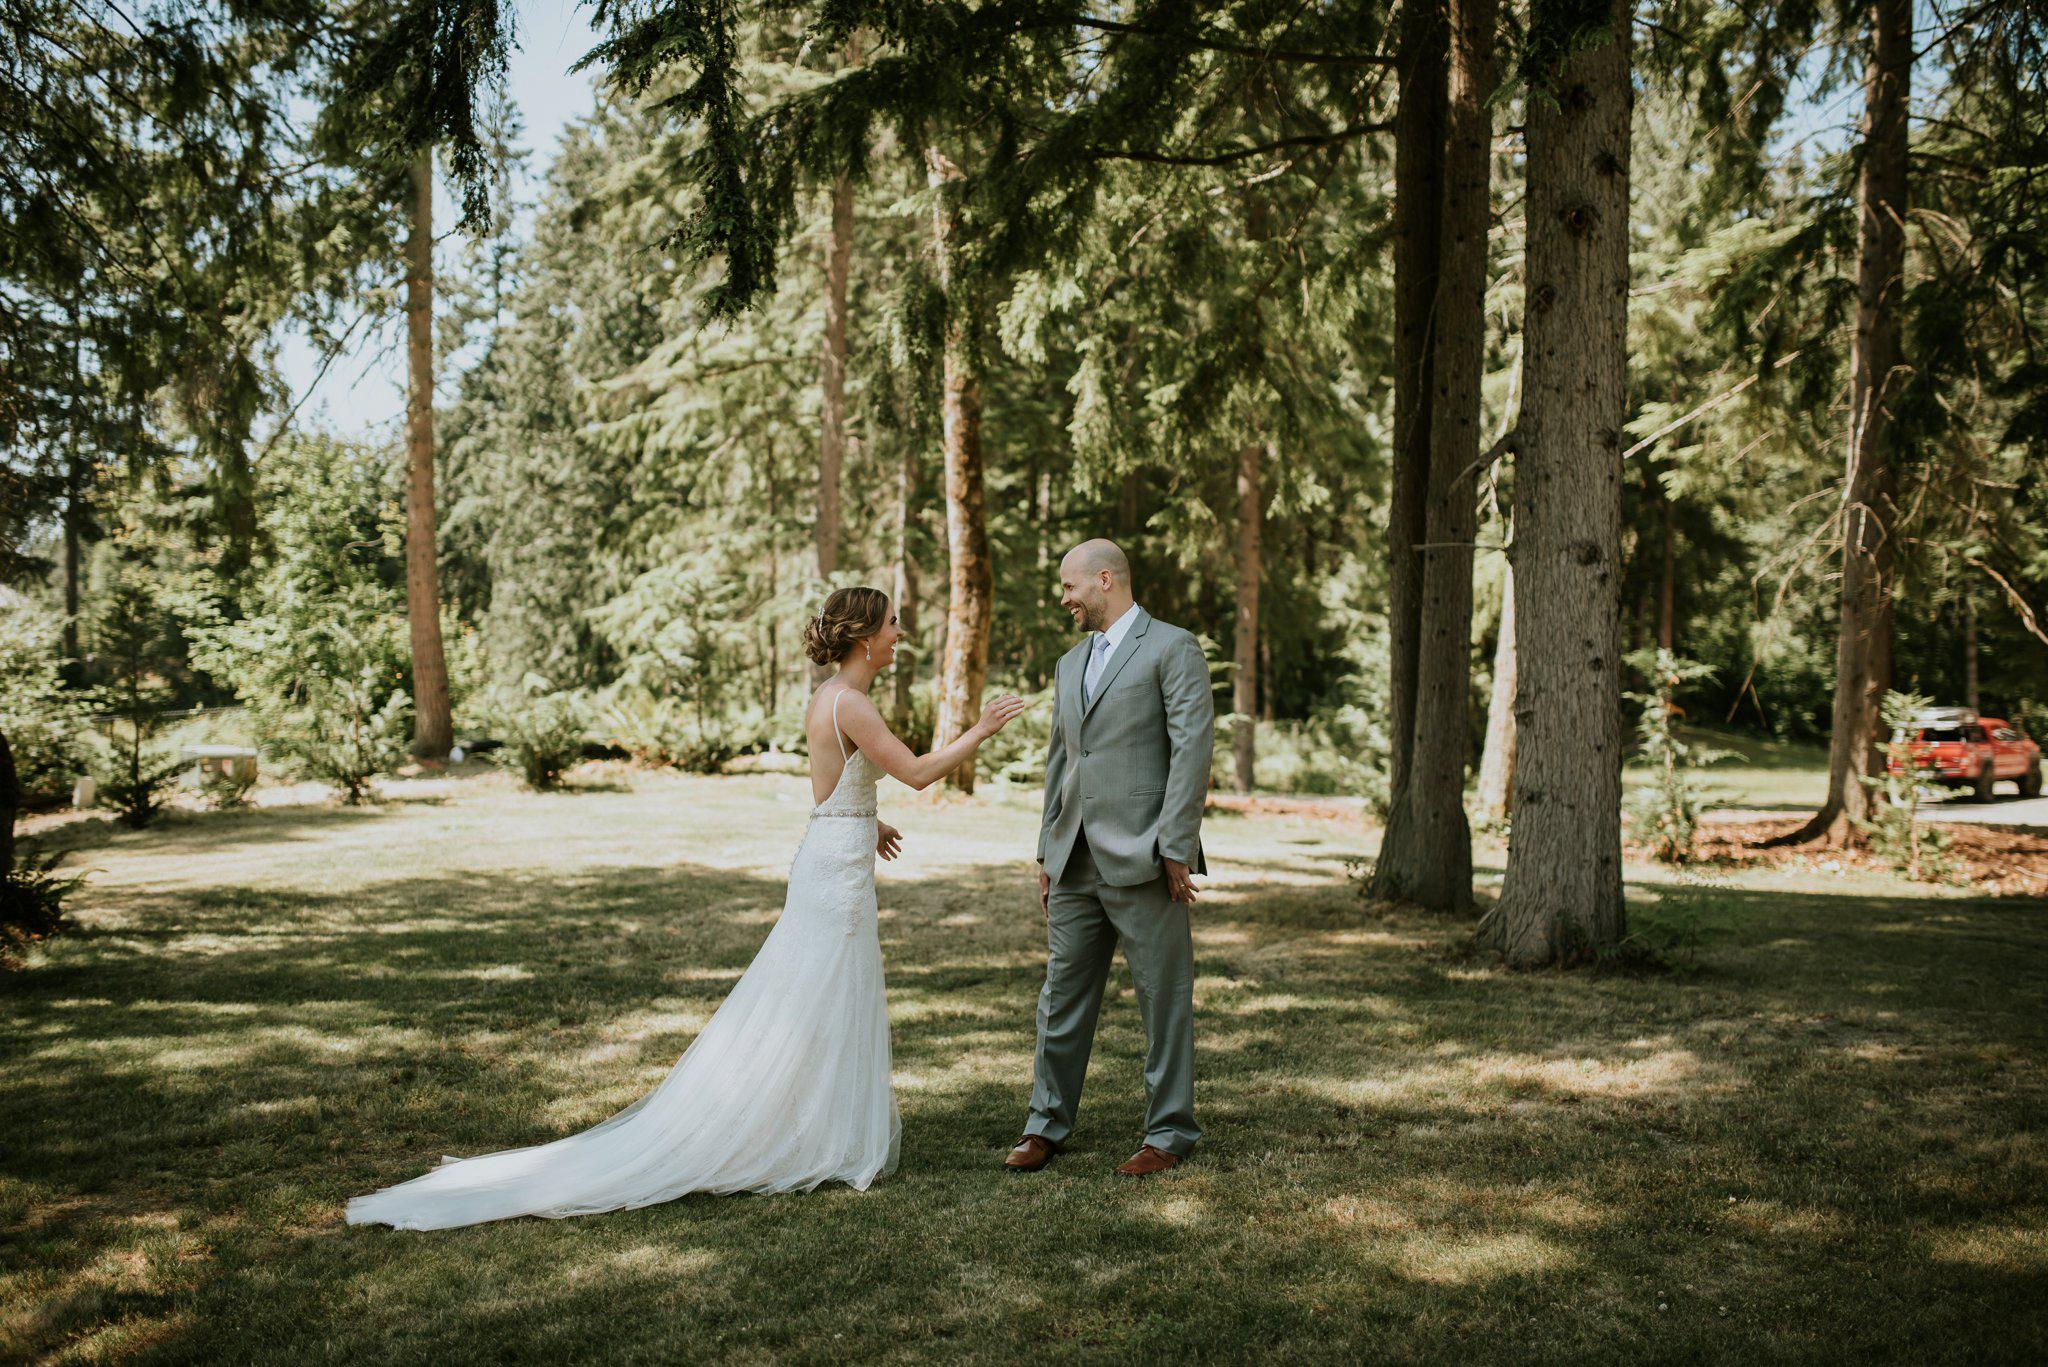 hollywood-school-house-wedding-seattle-photographer-caitlyn-nikula-34.jpg